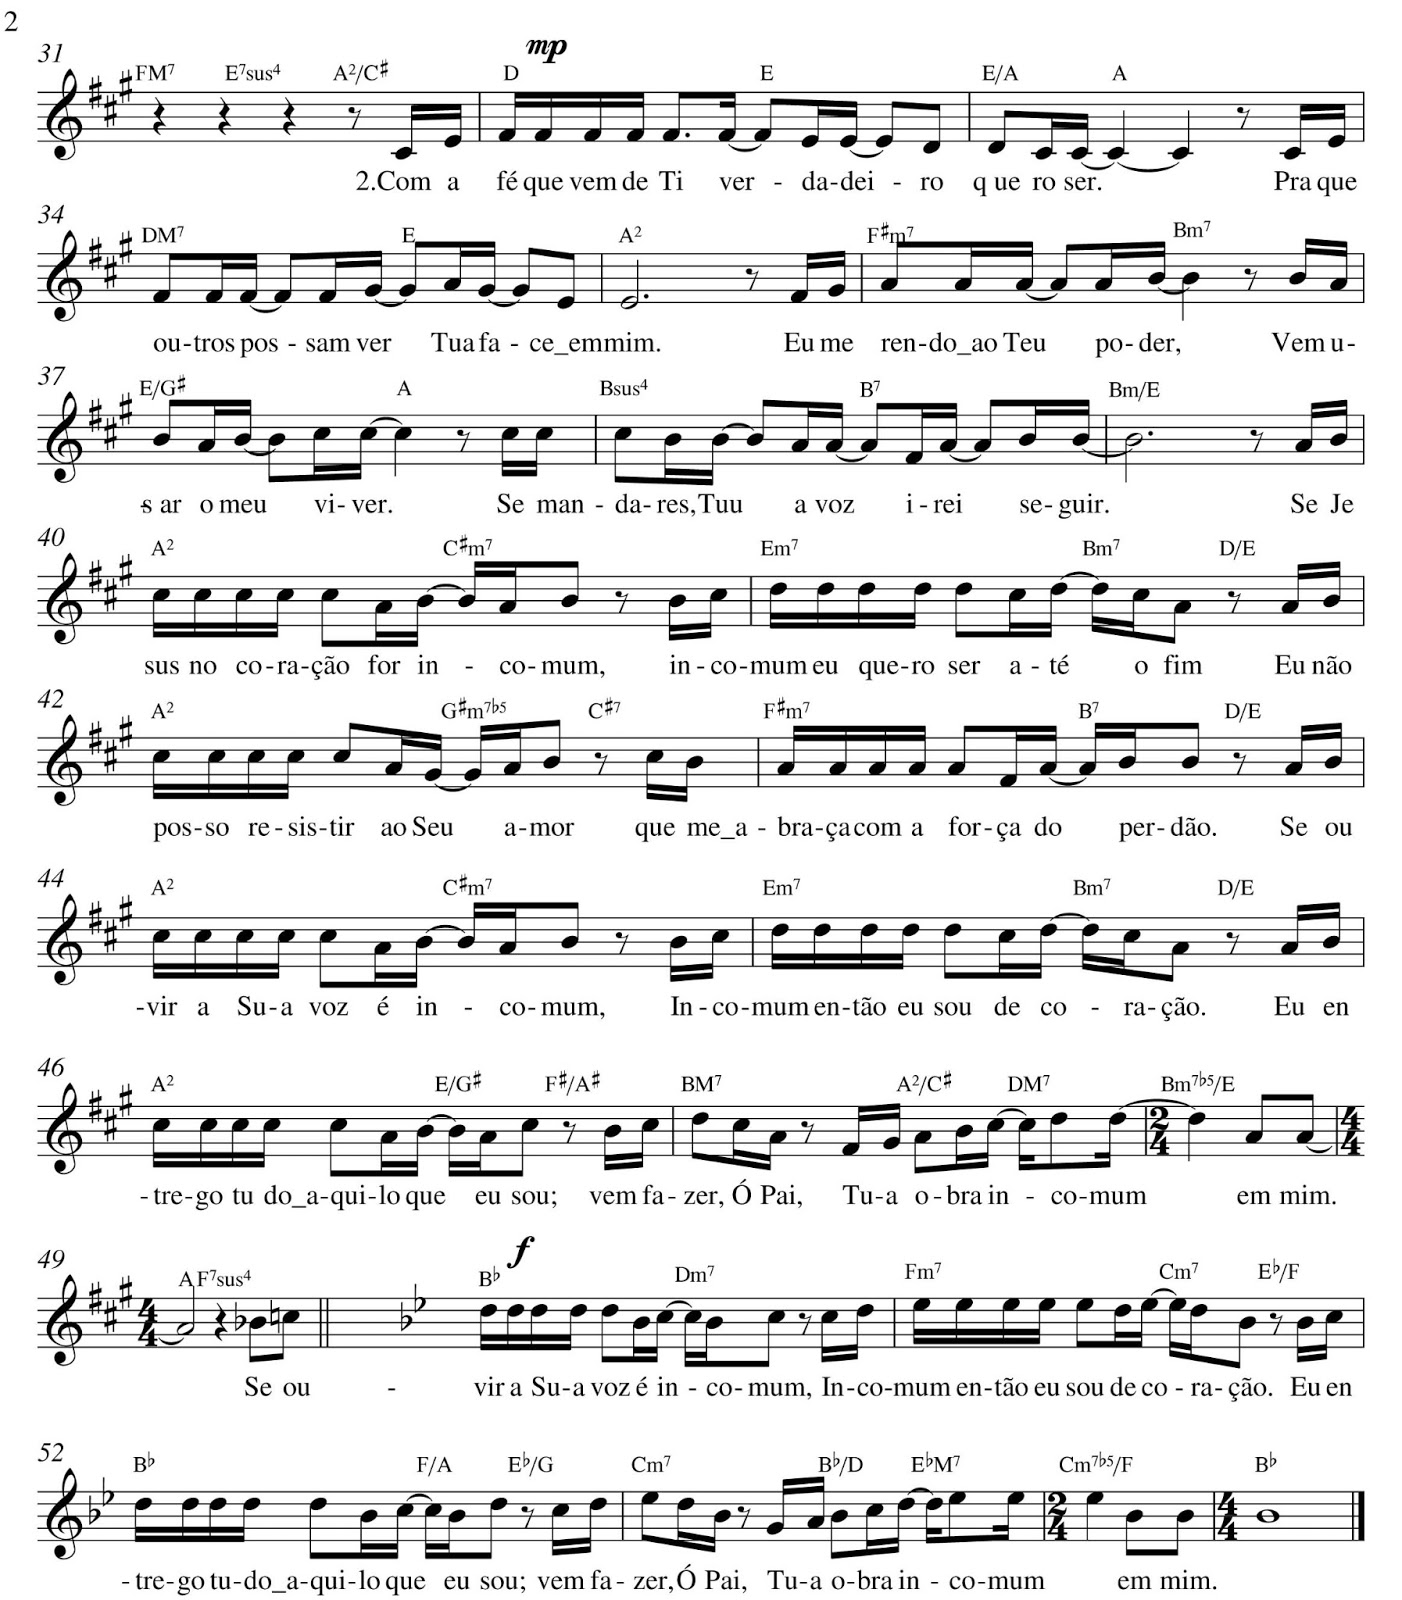 how to play ha um deus on piano